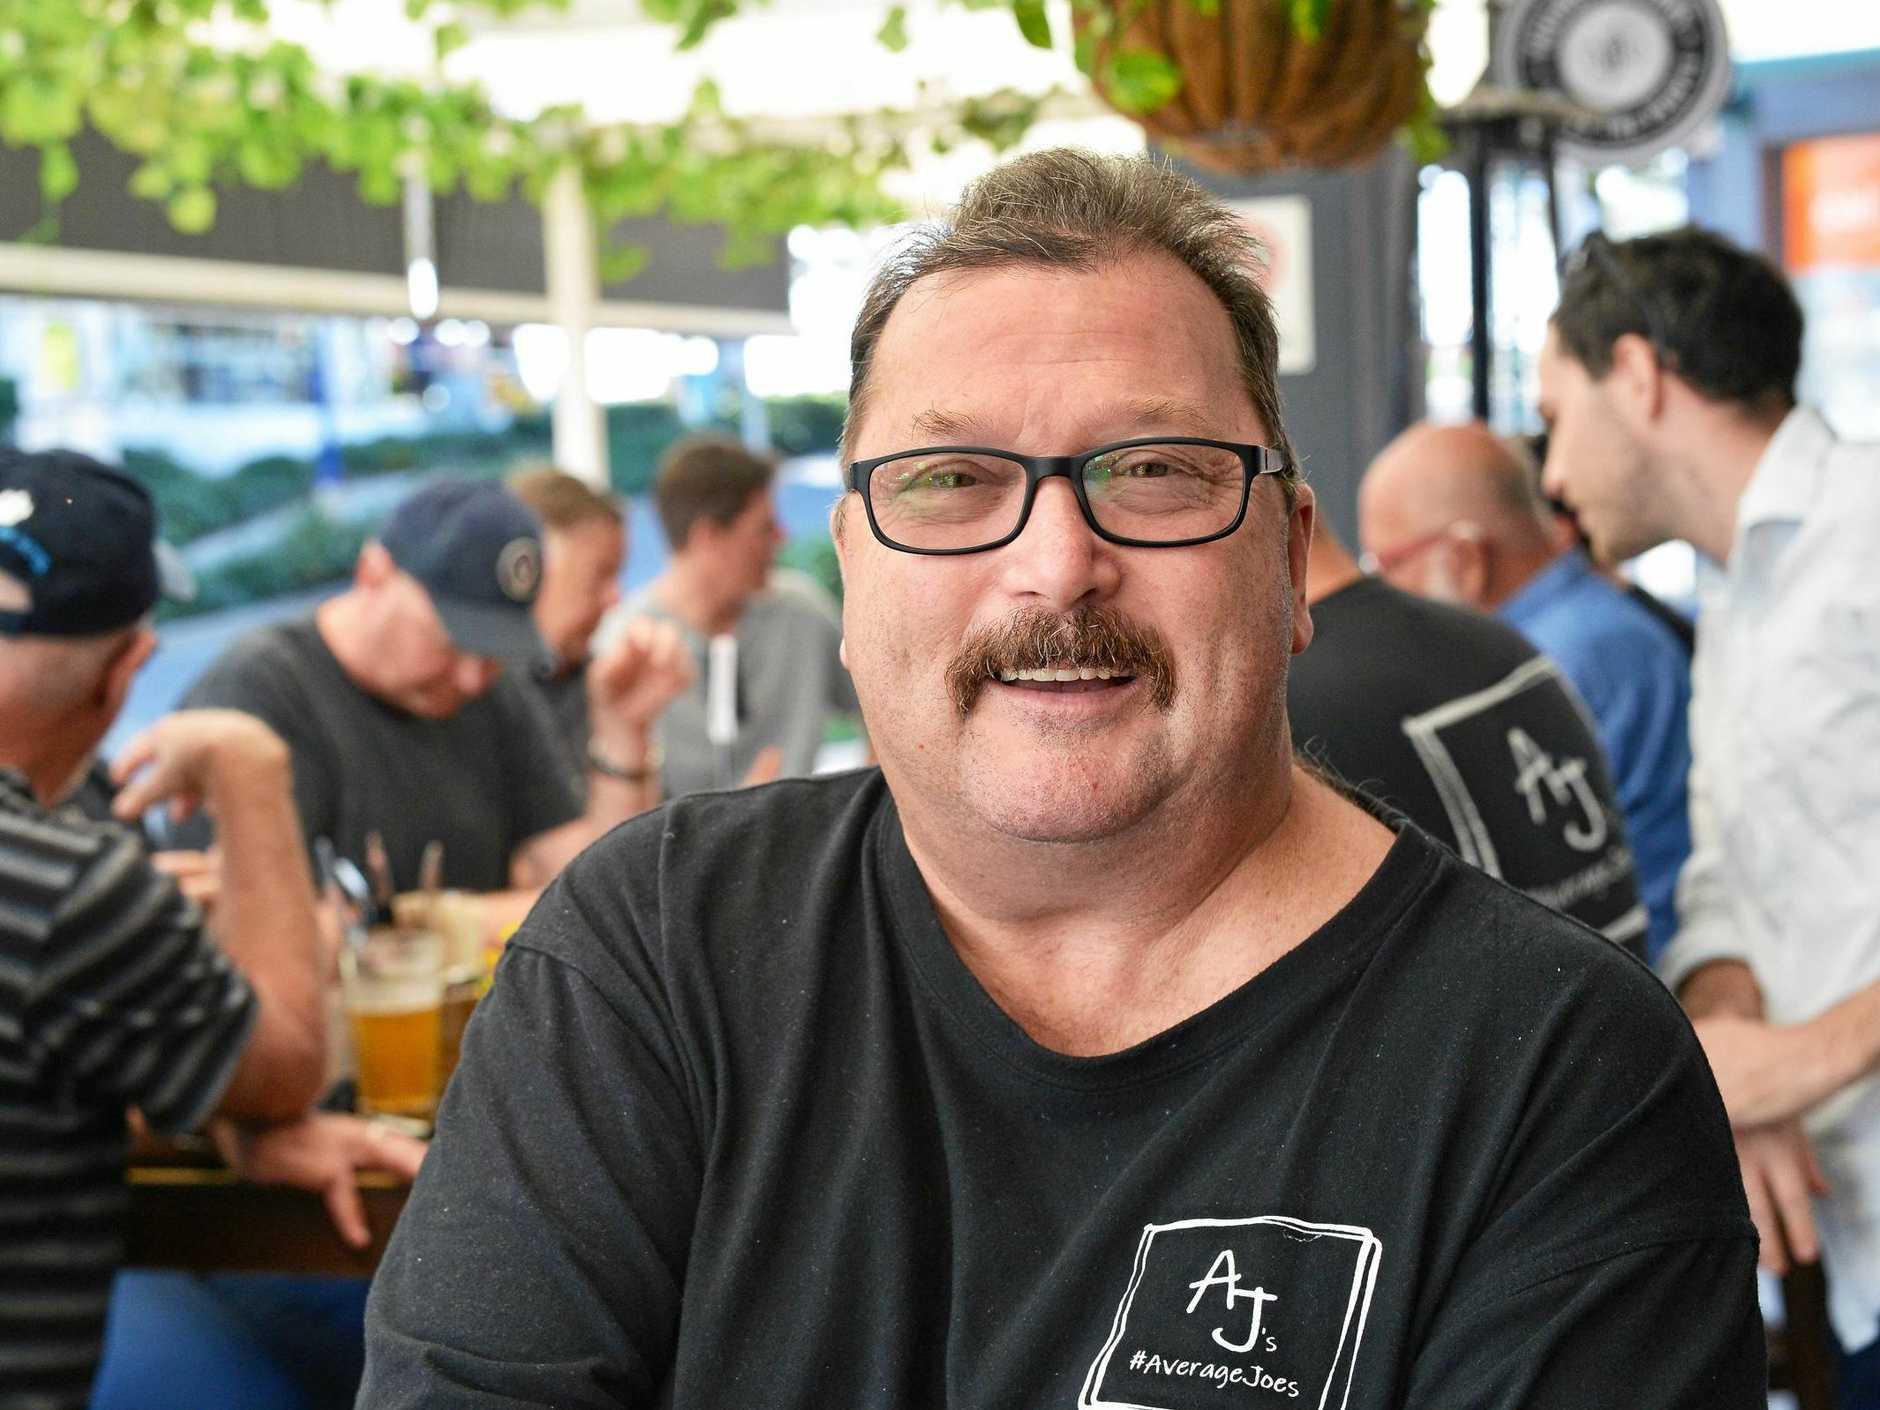 Coast men's health group member Richie Cording says Average Joes has saved his life.